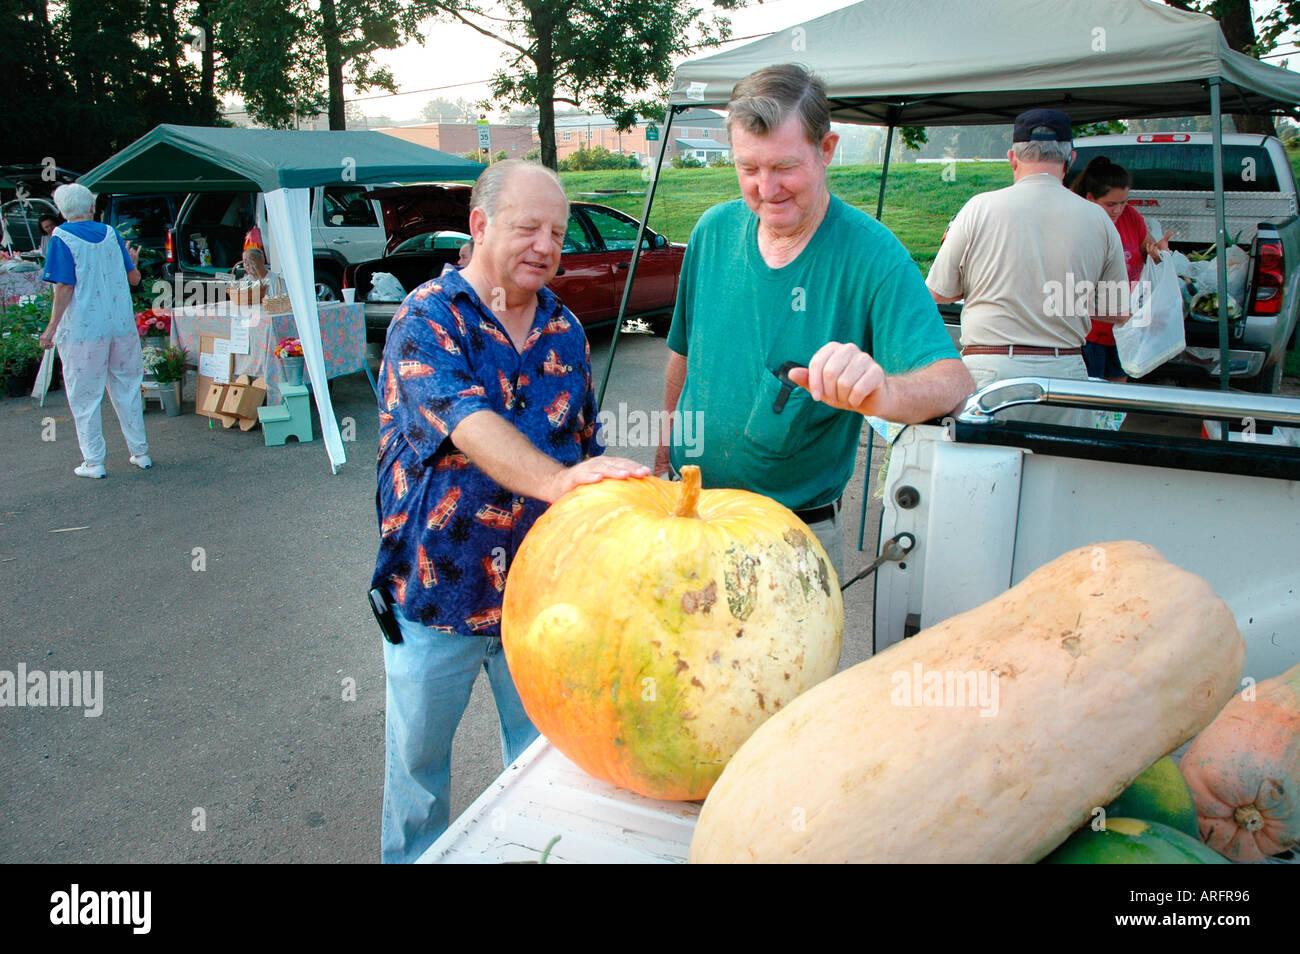 American Countryside Farmers Market Stock Photos & American